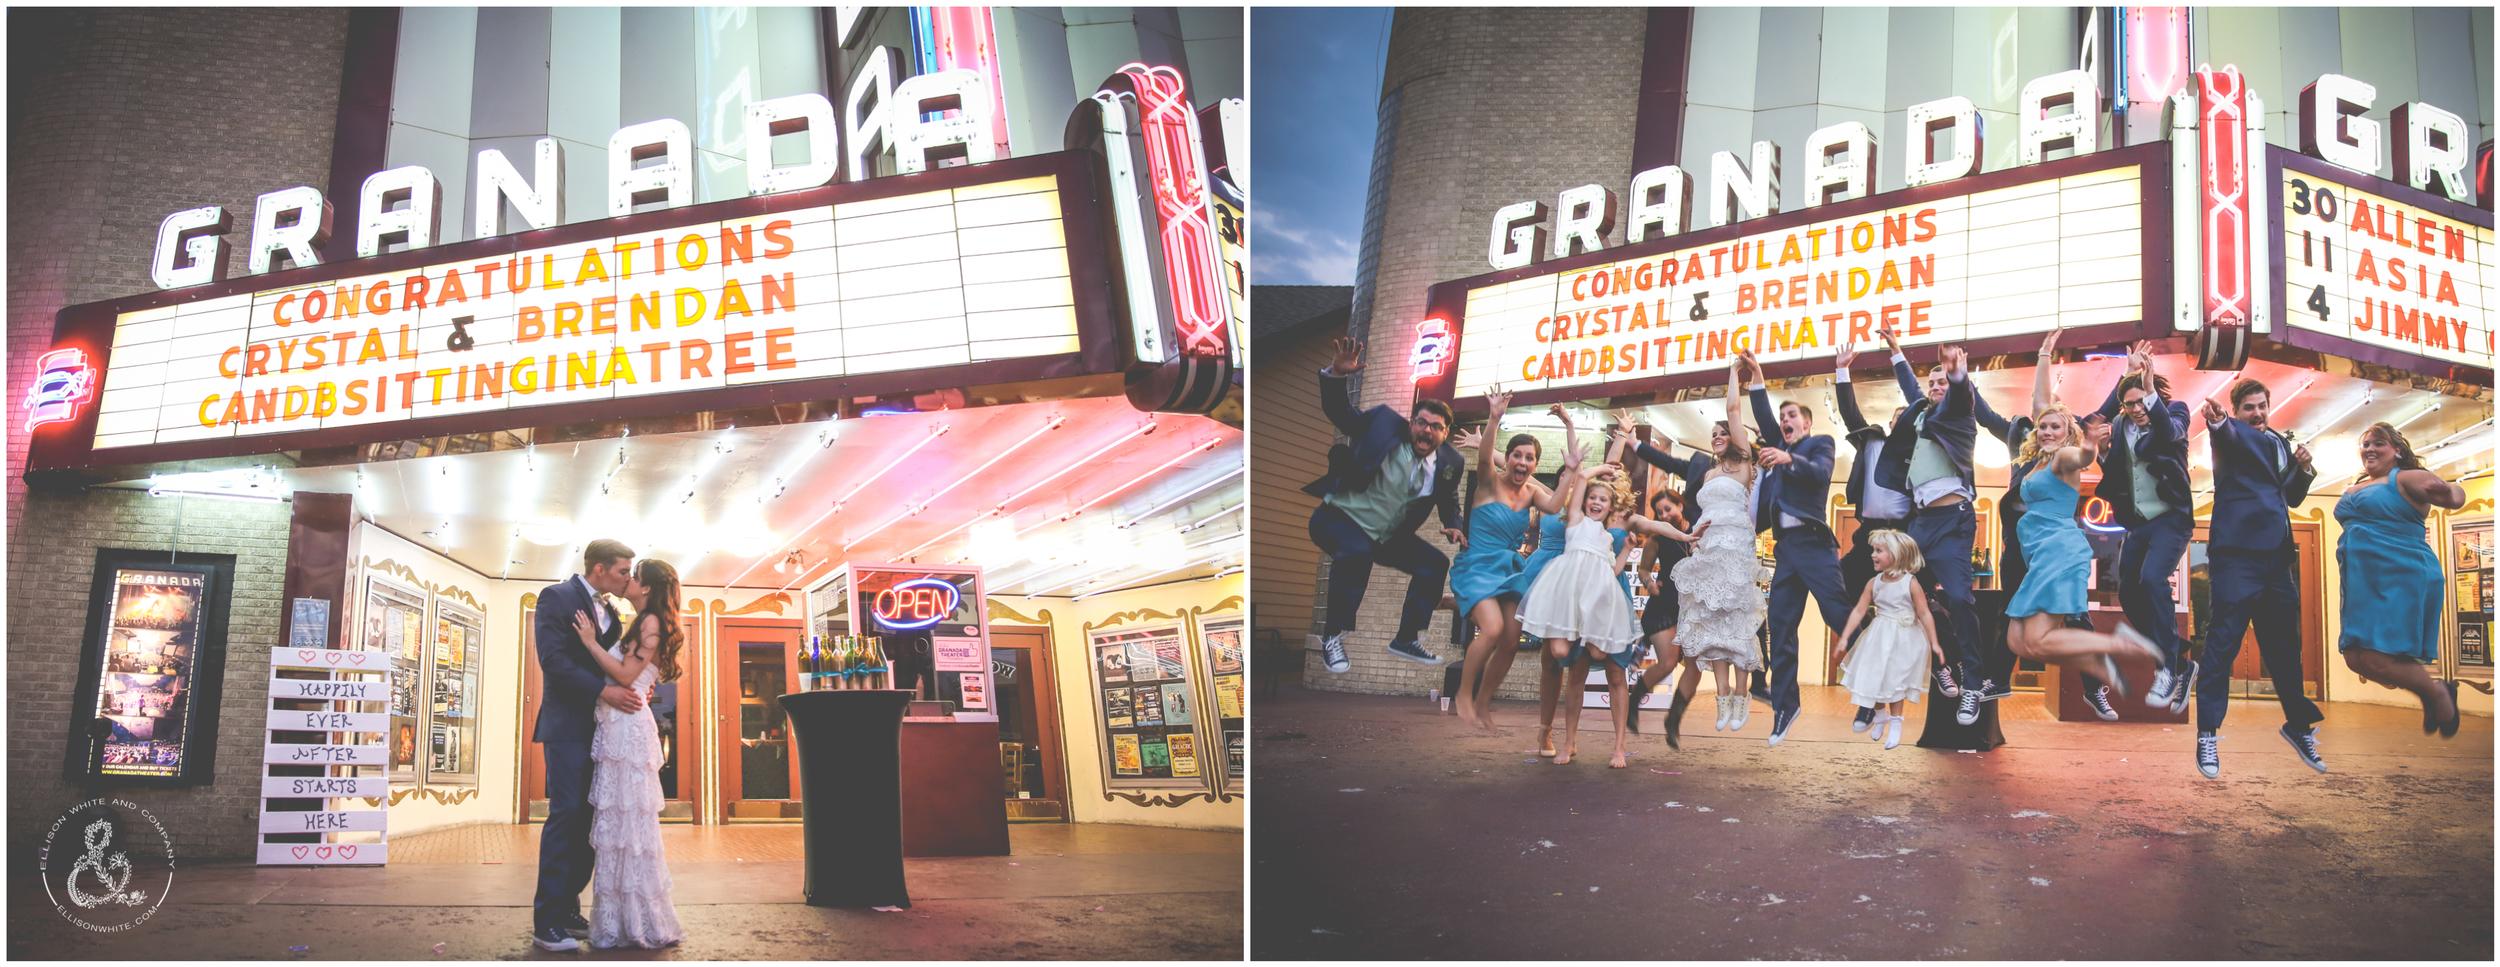 GranadaLightsCollage.jpg